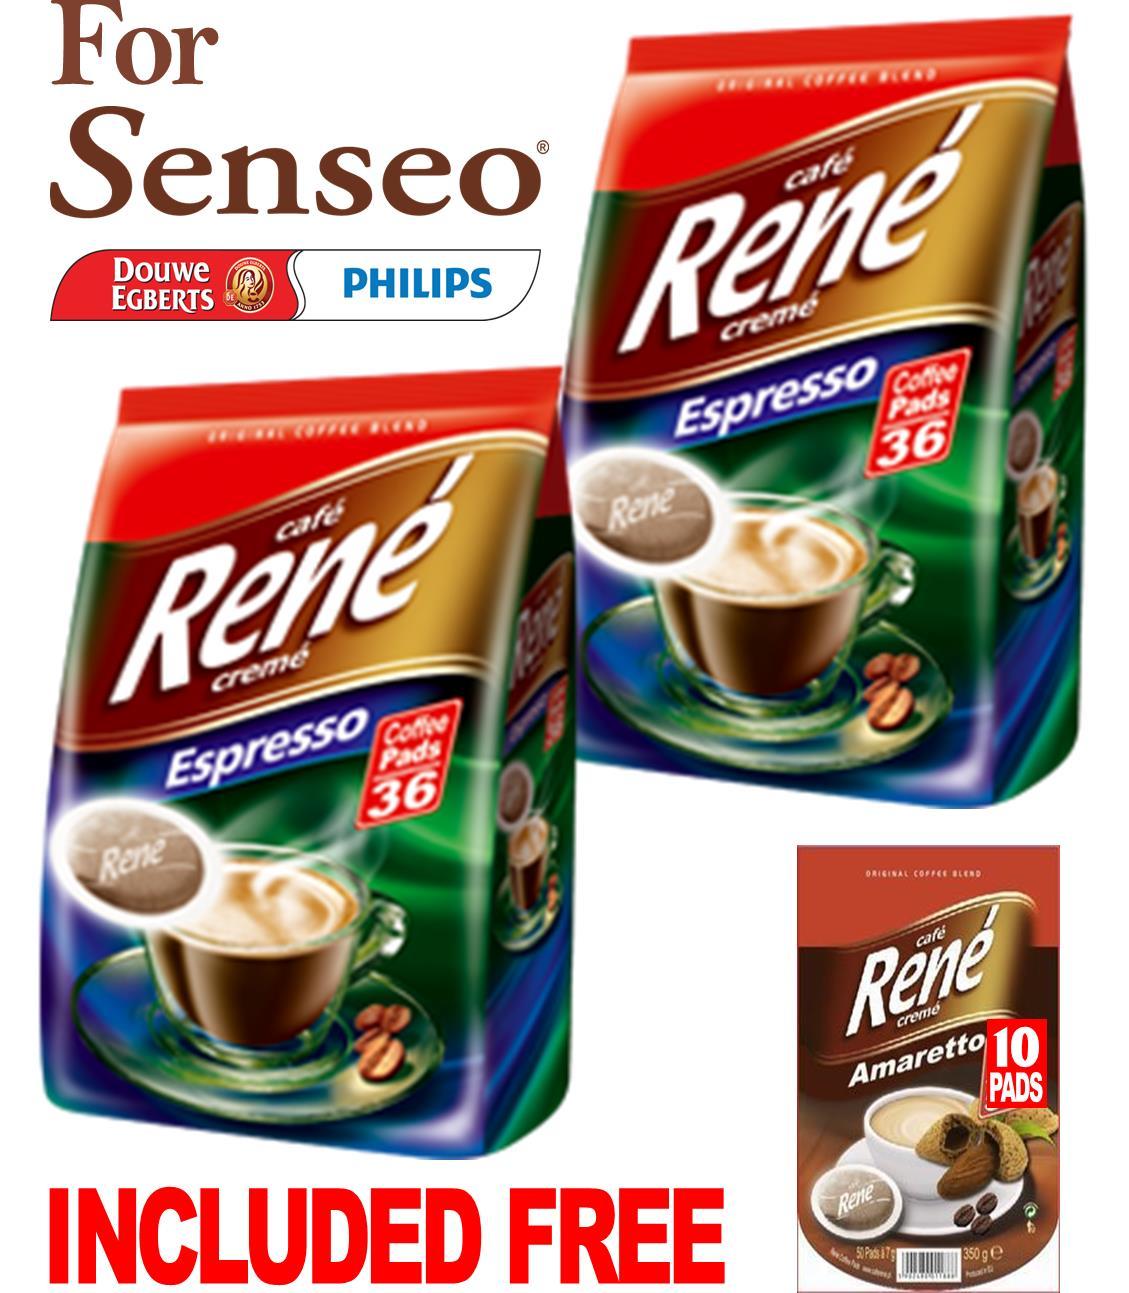 philips senseo 72 x cafe rene crem espresso roast coffee pads pods bags caf rene computer star. Black Bedroom Furniture Sets. Home Design Ideas